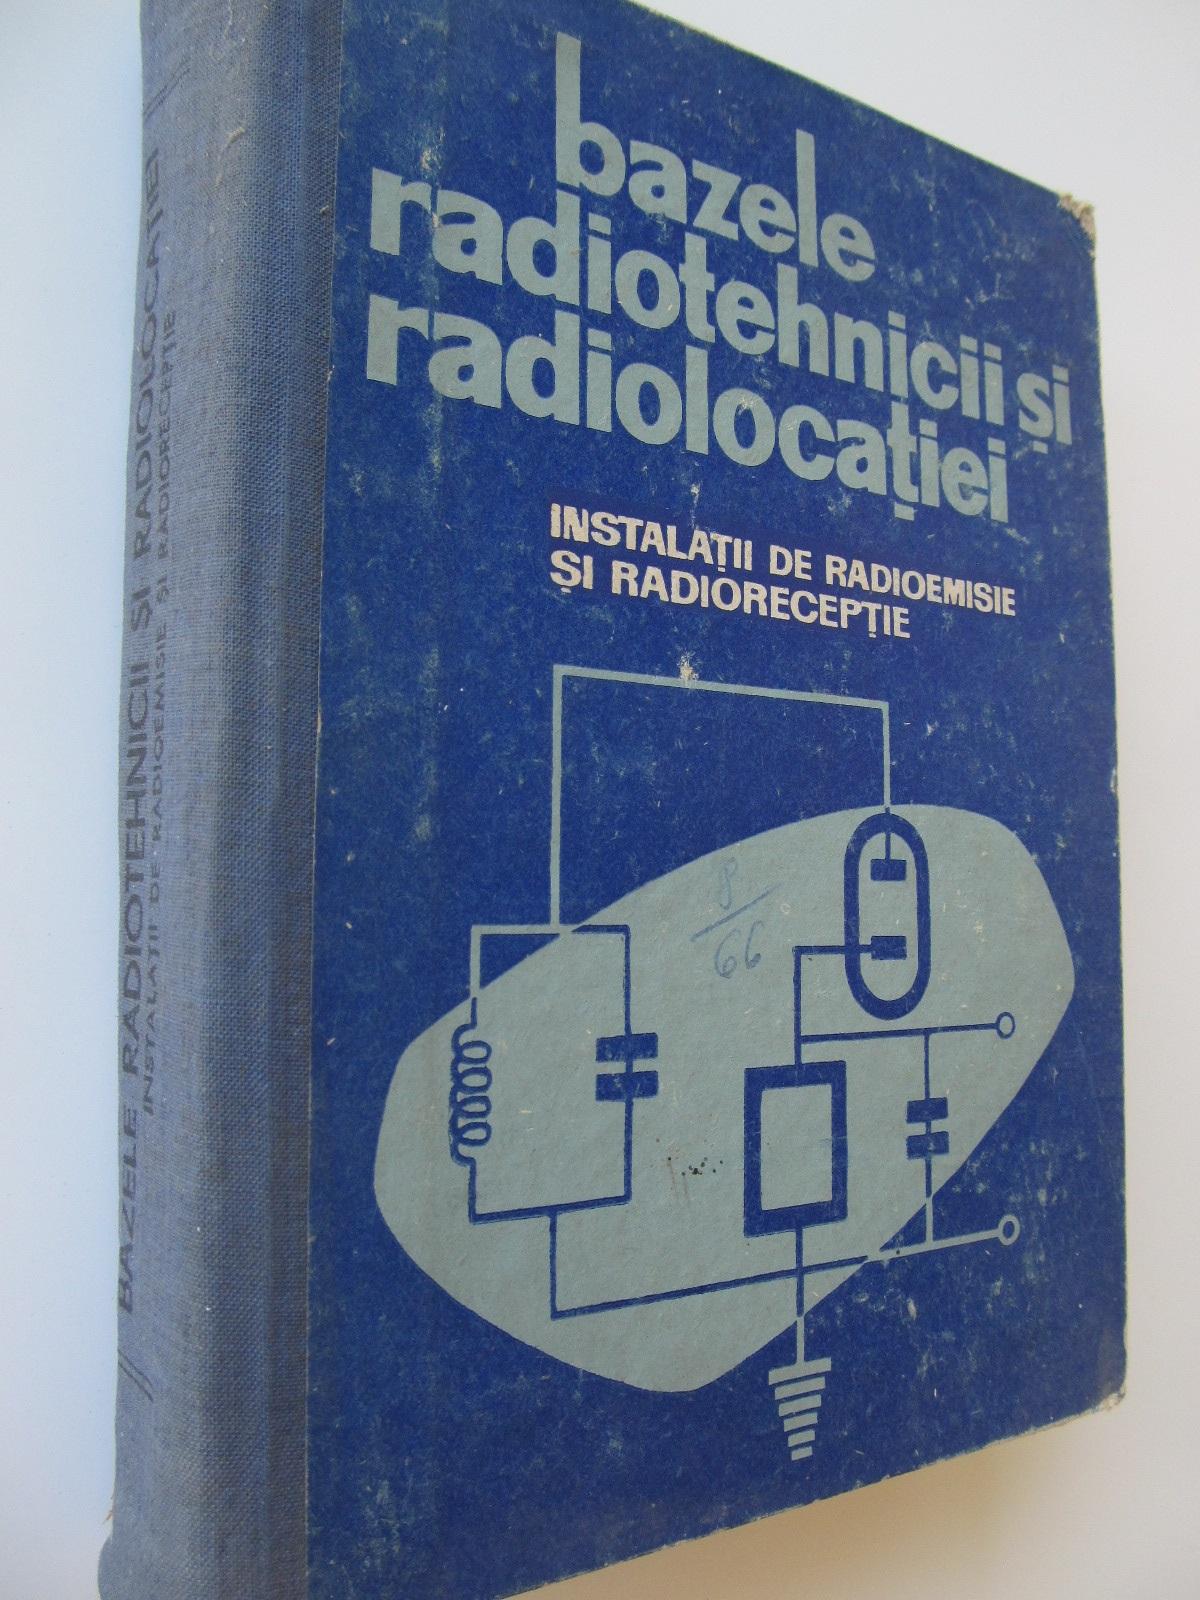 Bazele radiotehnicii si radiolocatiei - instalatii de radioemisie si radioreceptie - *** | Detalii carte